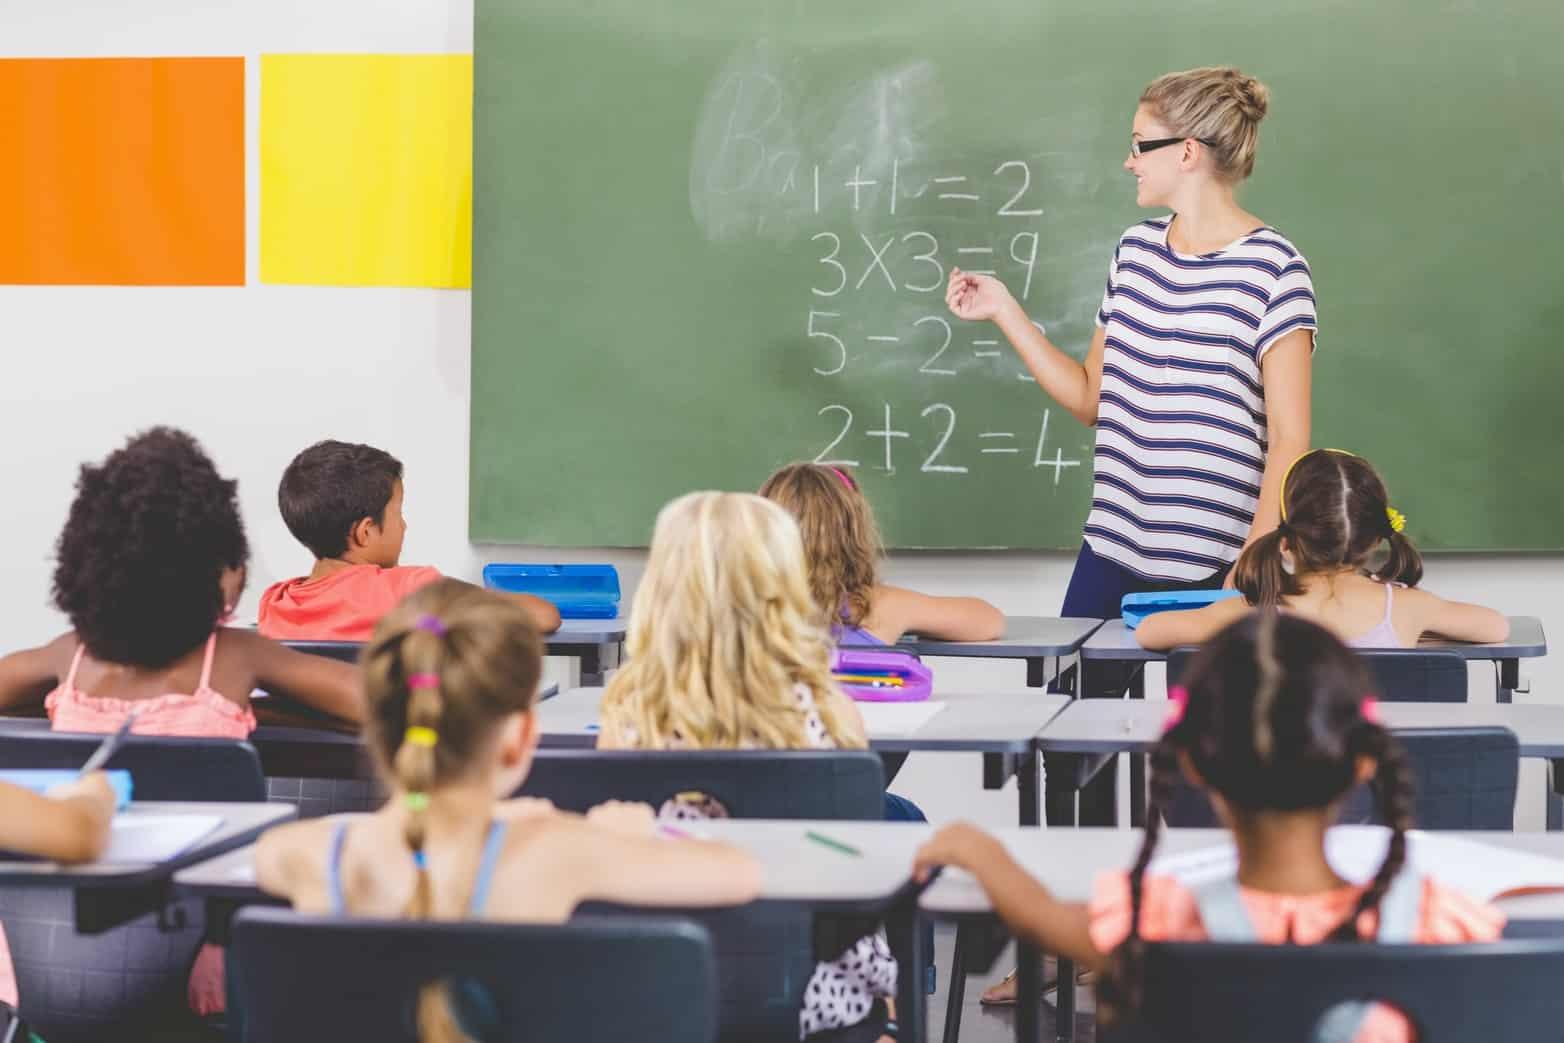 Teacher teaching mathematics to students in a classroom